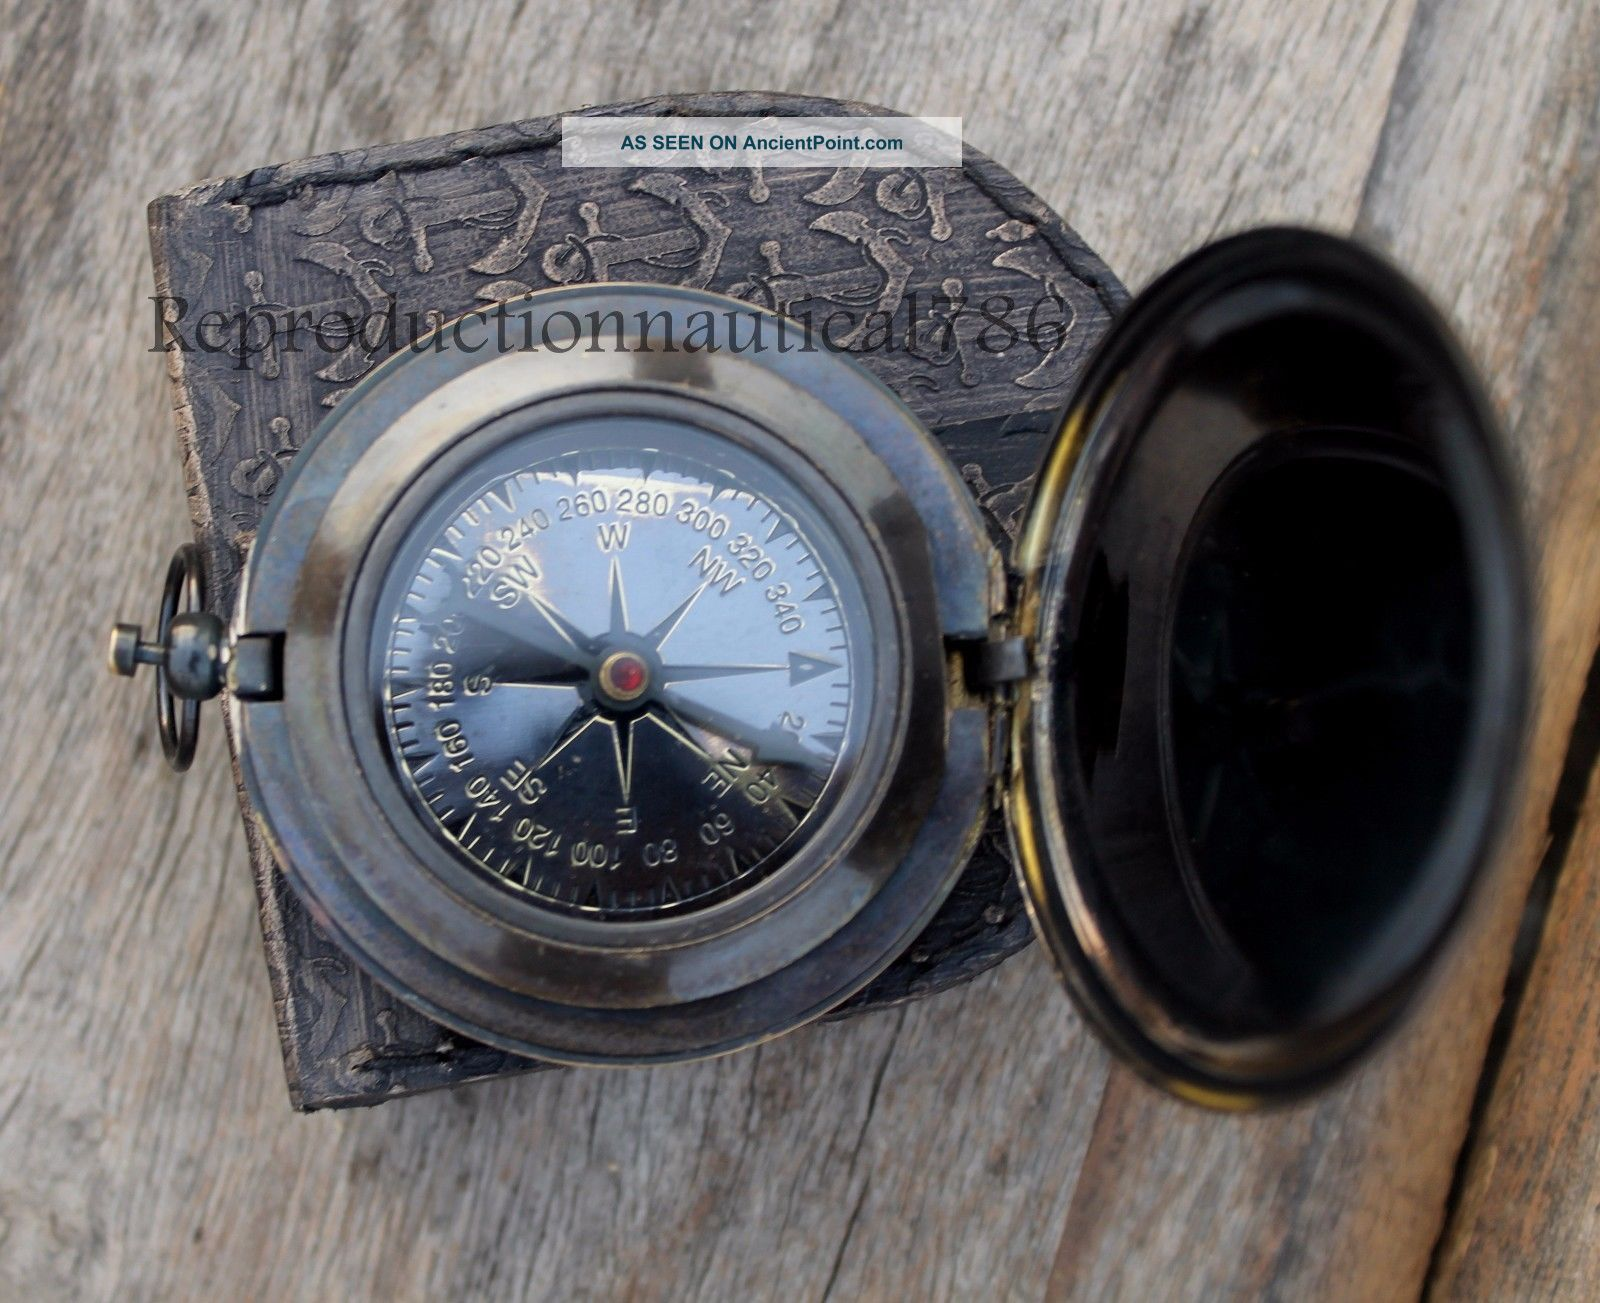 Handmade Brass Antique Push Button Navigation Compass Marine Astrolabe Compass Compasses photo